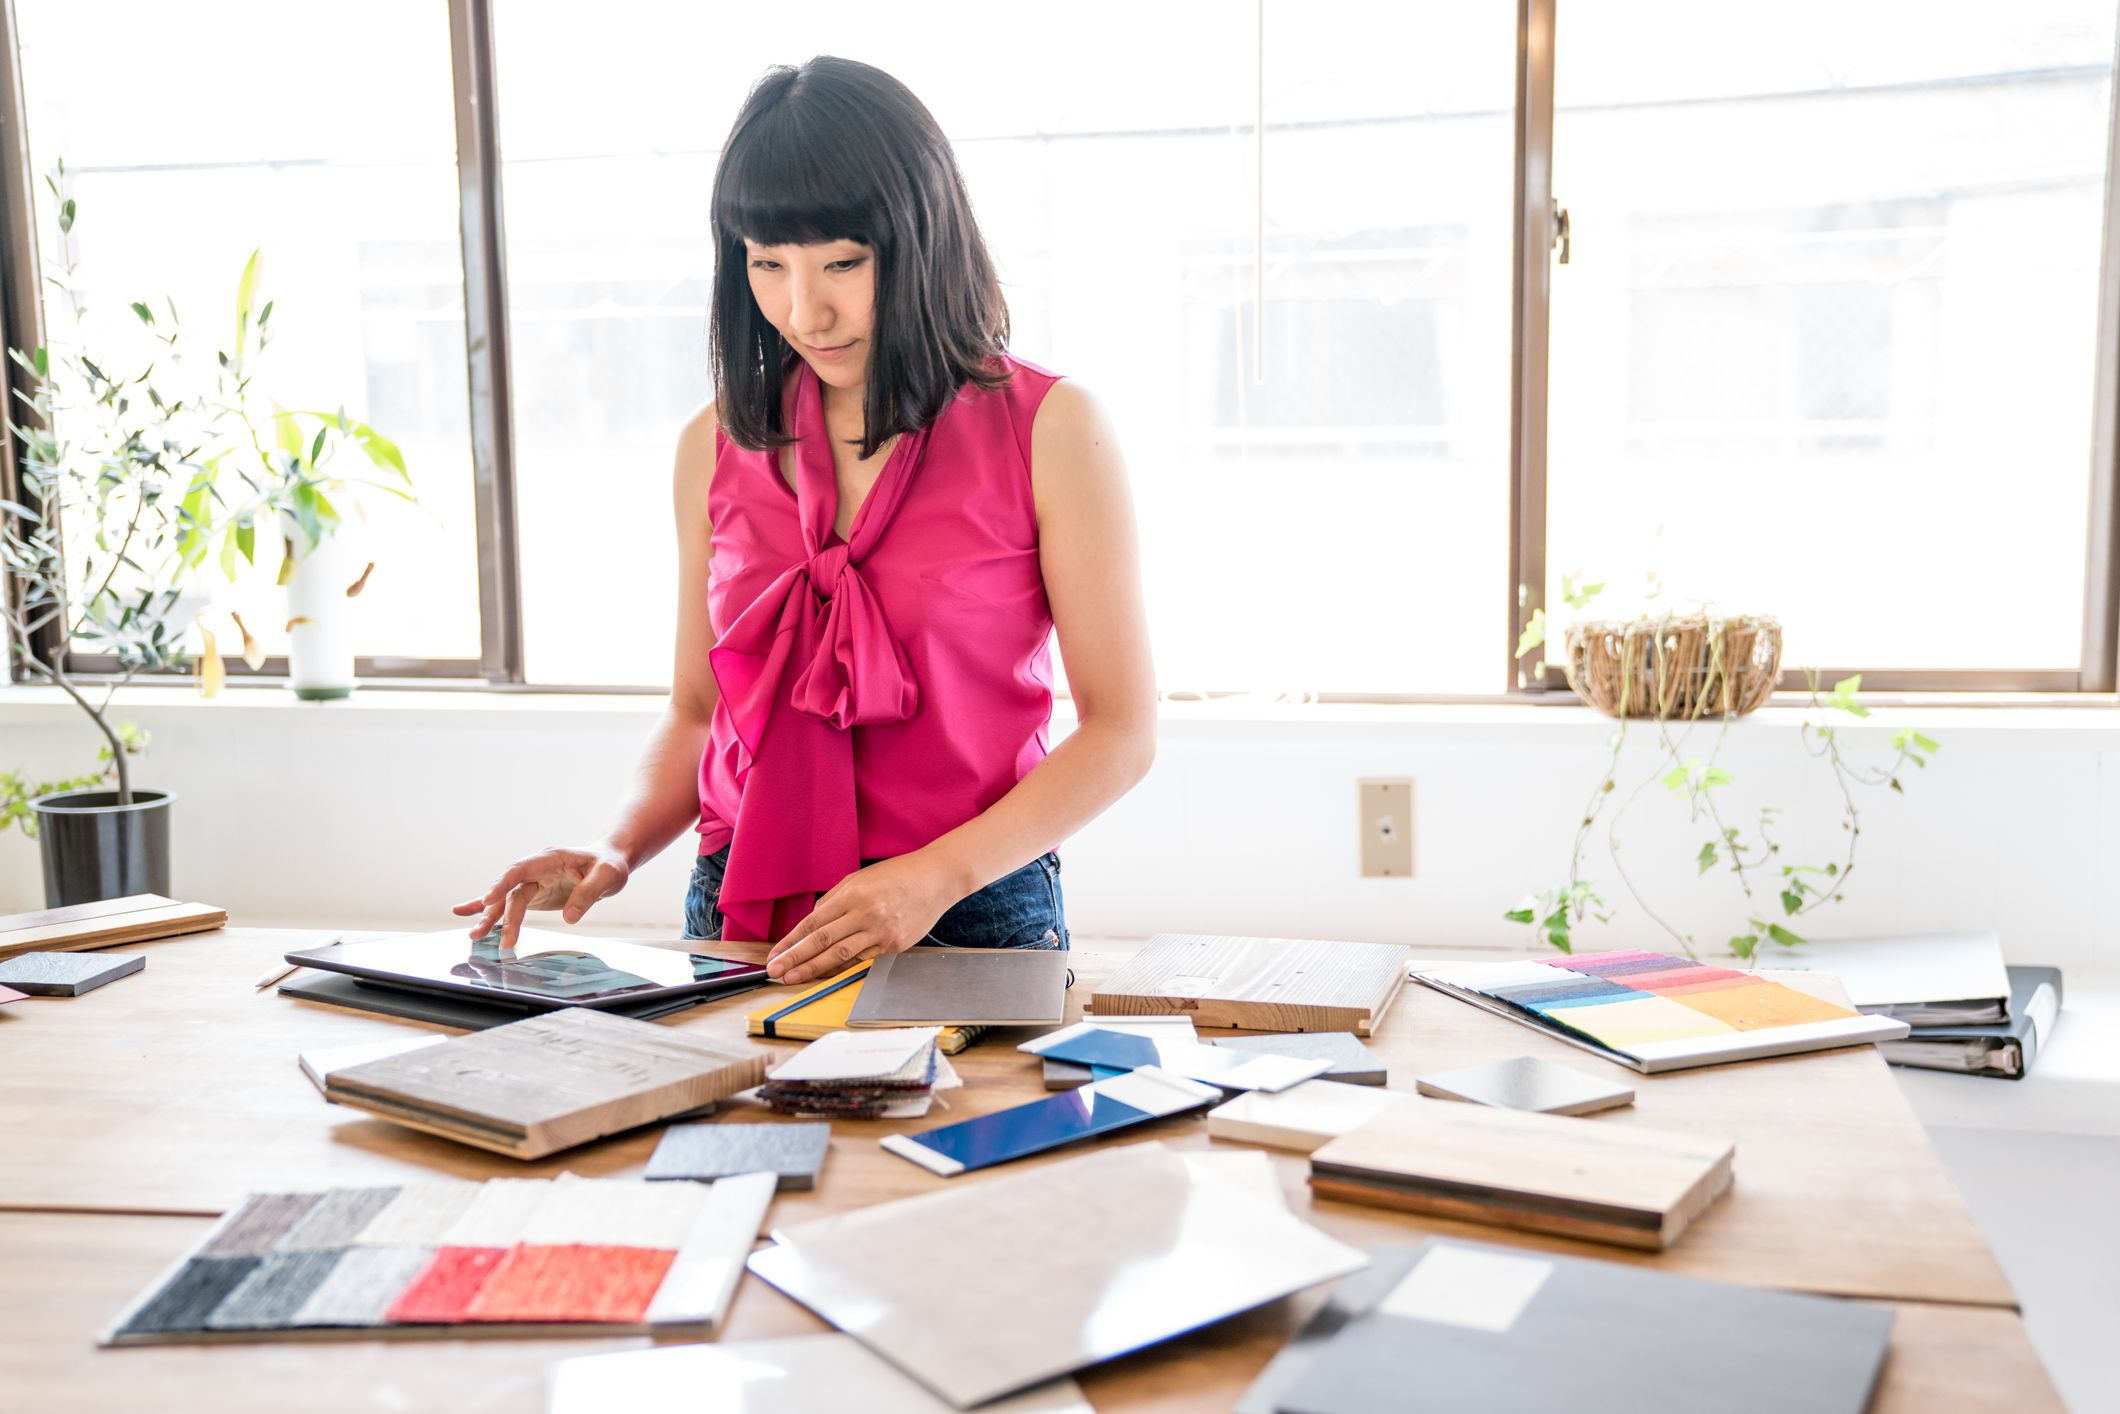 Tips for Entering the Wonderful World of Design